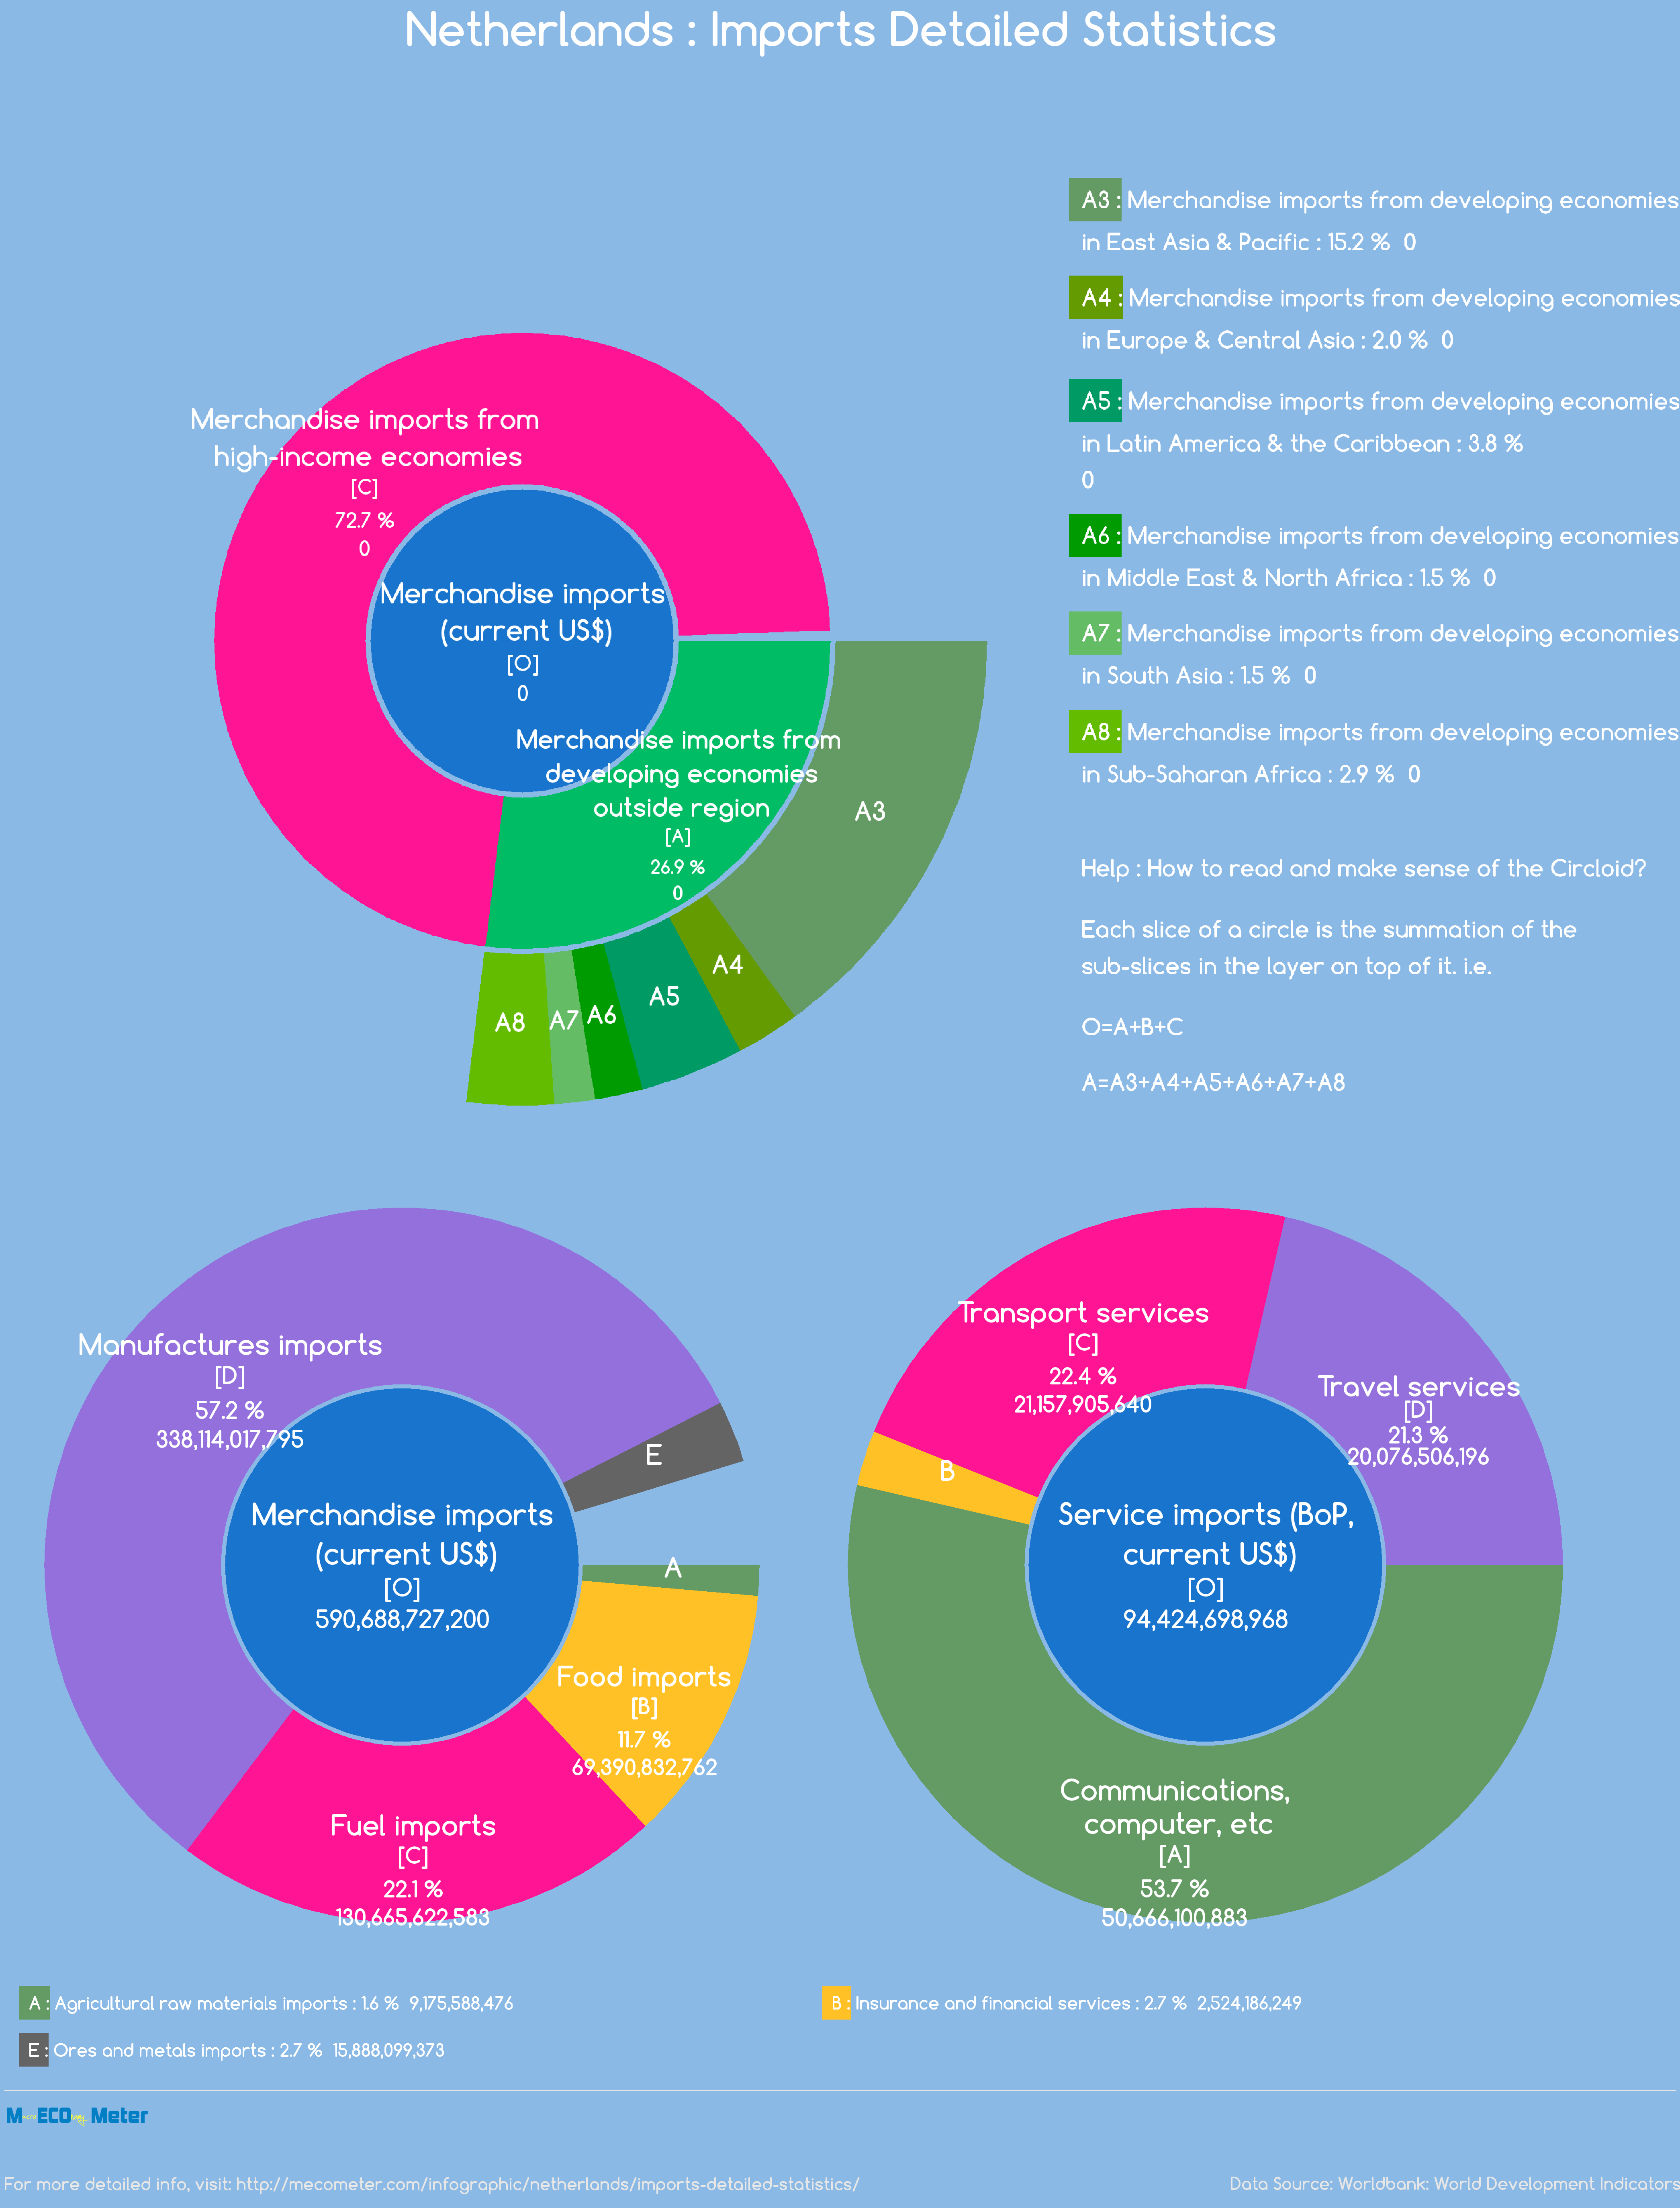 Netherlands : Imports Detailed Statistics